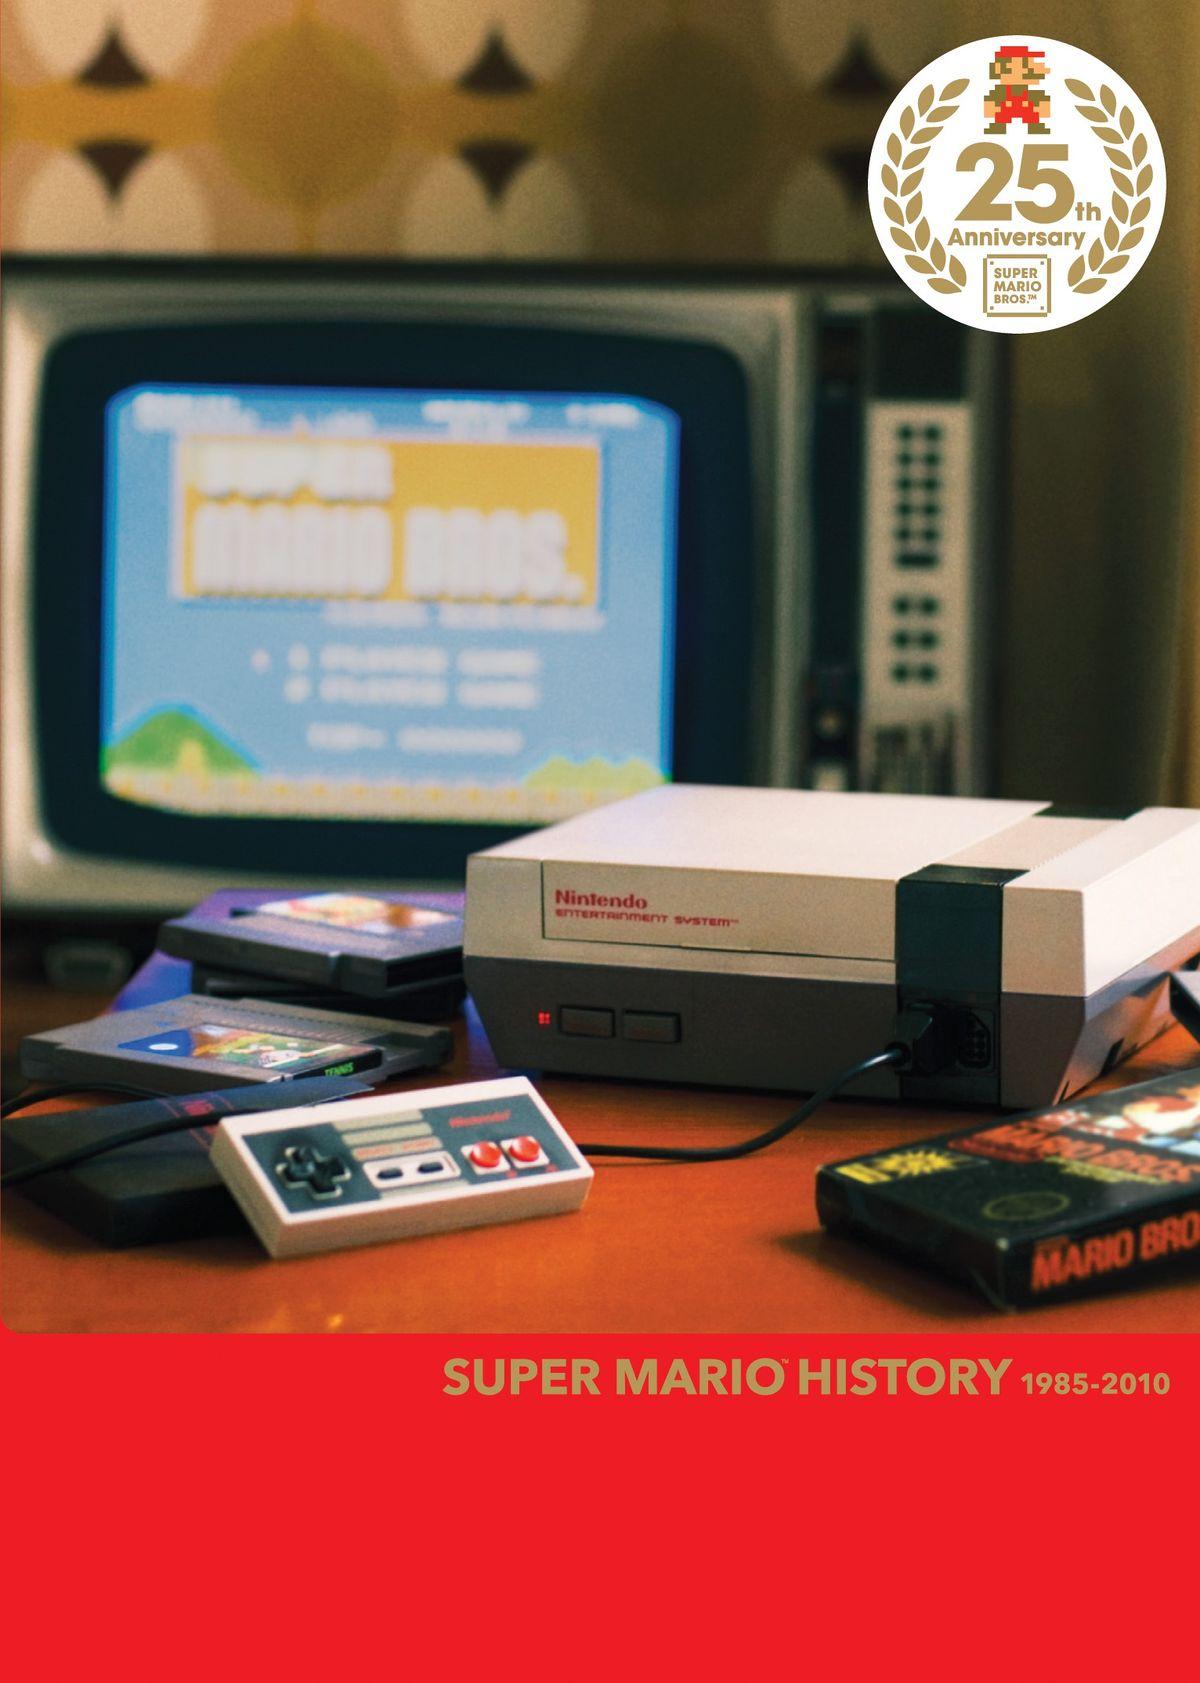 Wallpaper Iphone Galaxy Super Mario History 1985 2010 Super Mario Wiki The